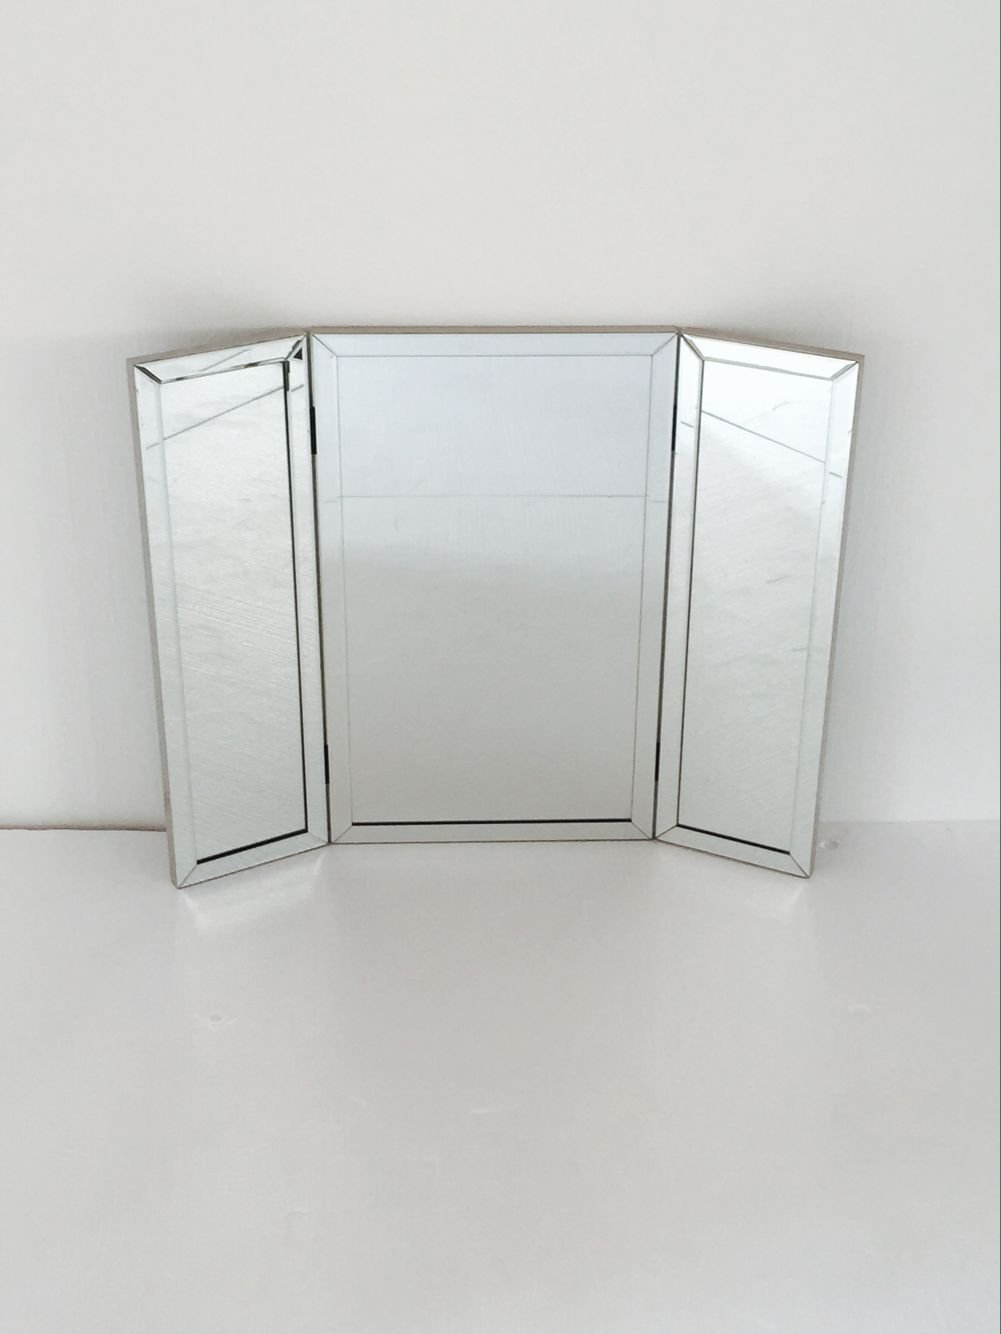 Tri-Fold Adjustable Desk-Top/Table Vanity Mirror by Designstyles